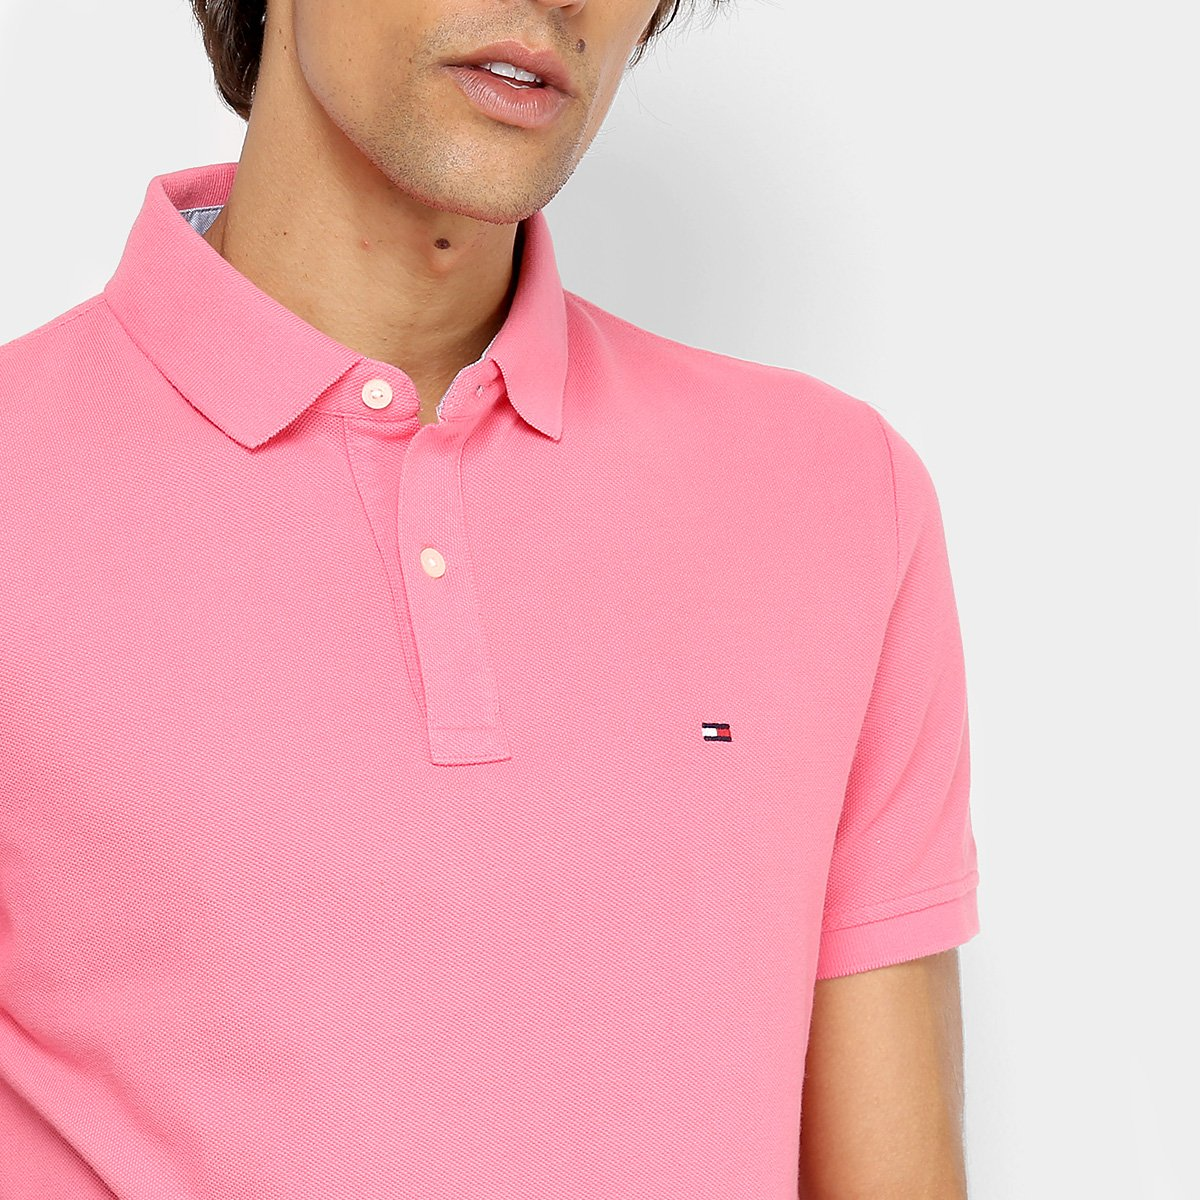 74f058e949 Camisa Polo Tommy Hilfiger Básica Masculina - Rosa - Compre Agora ...